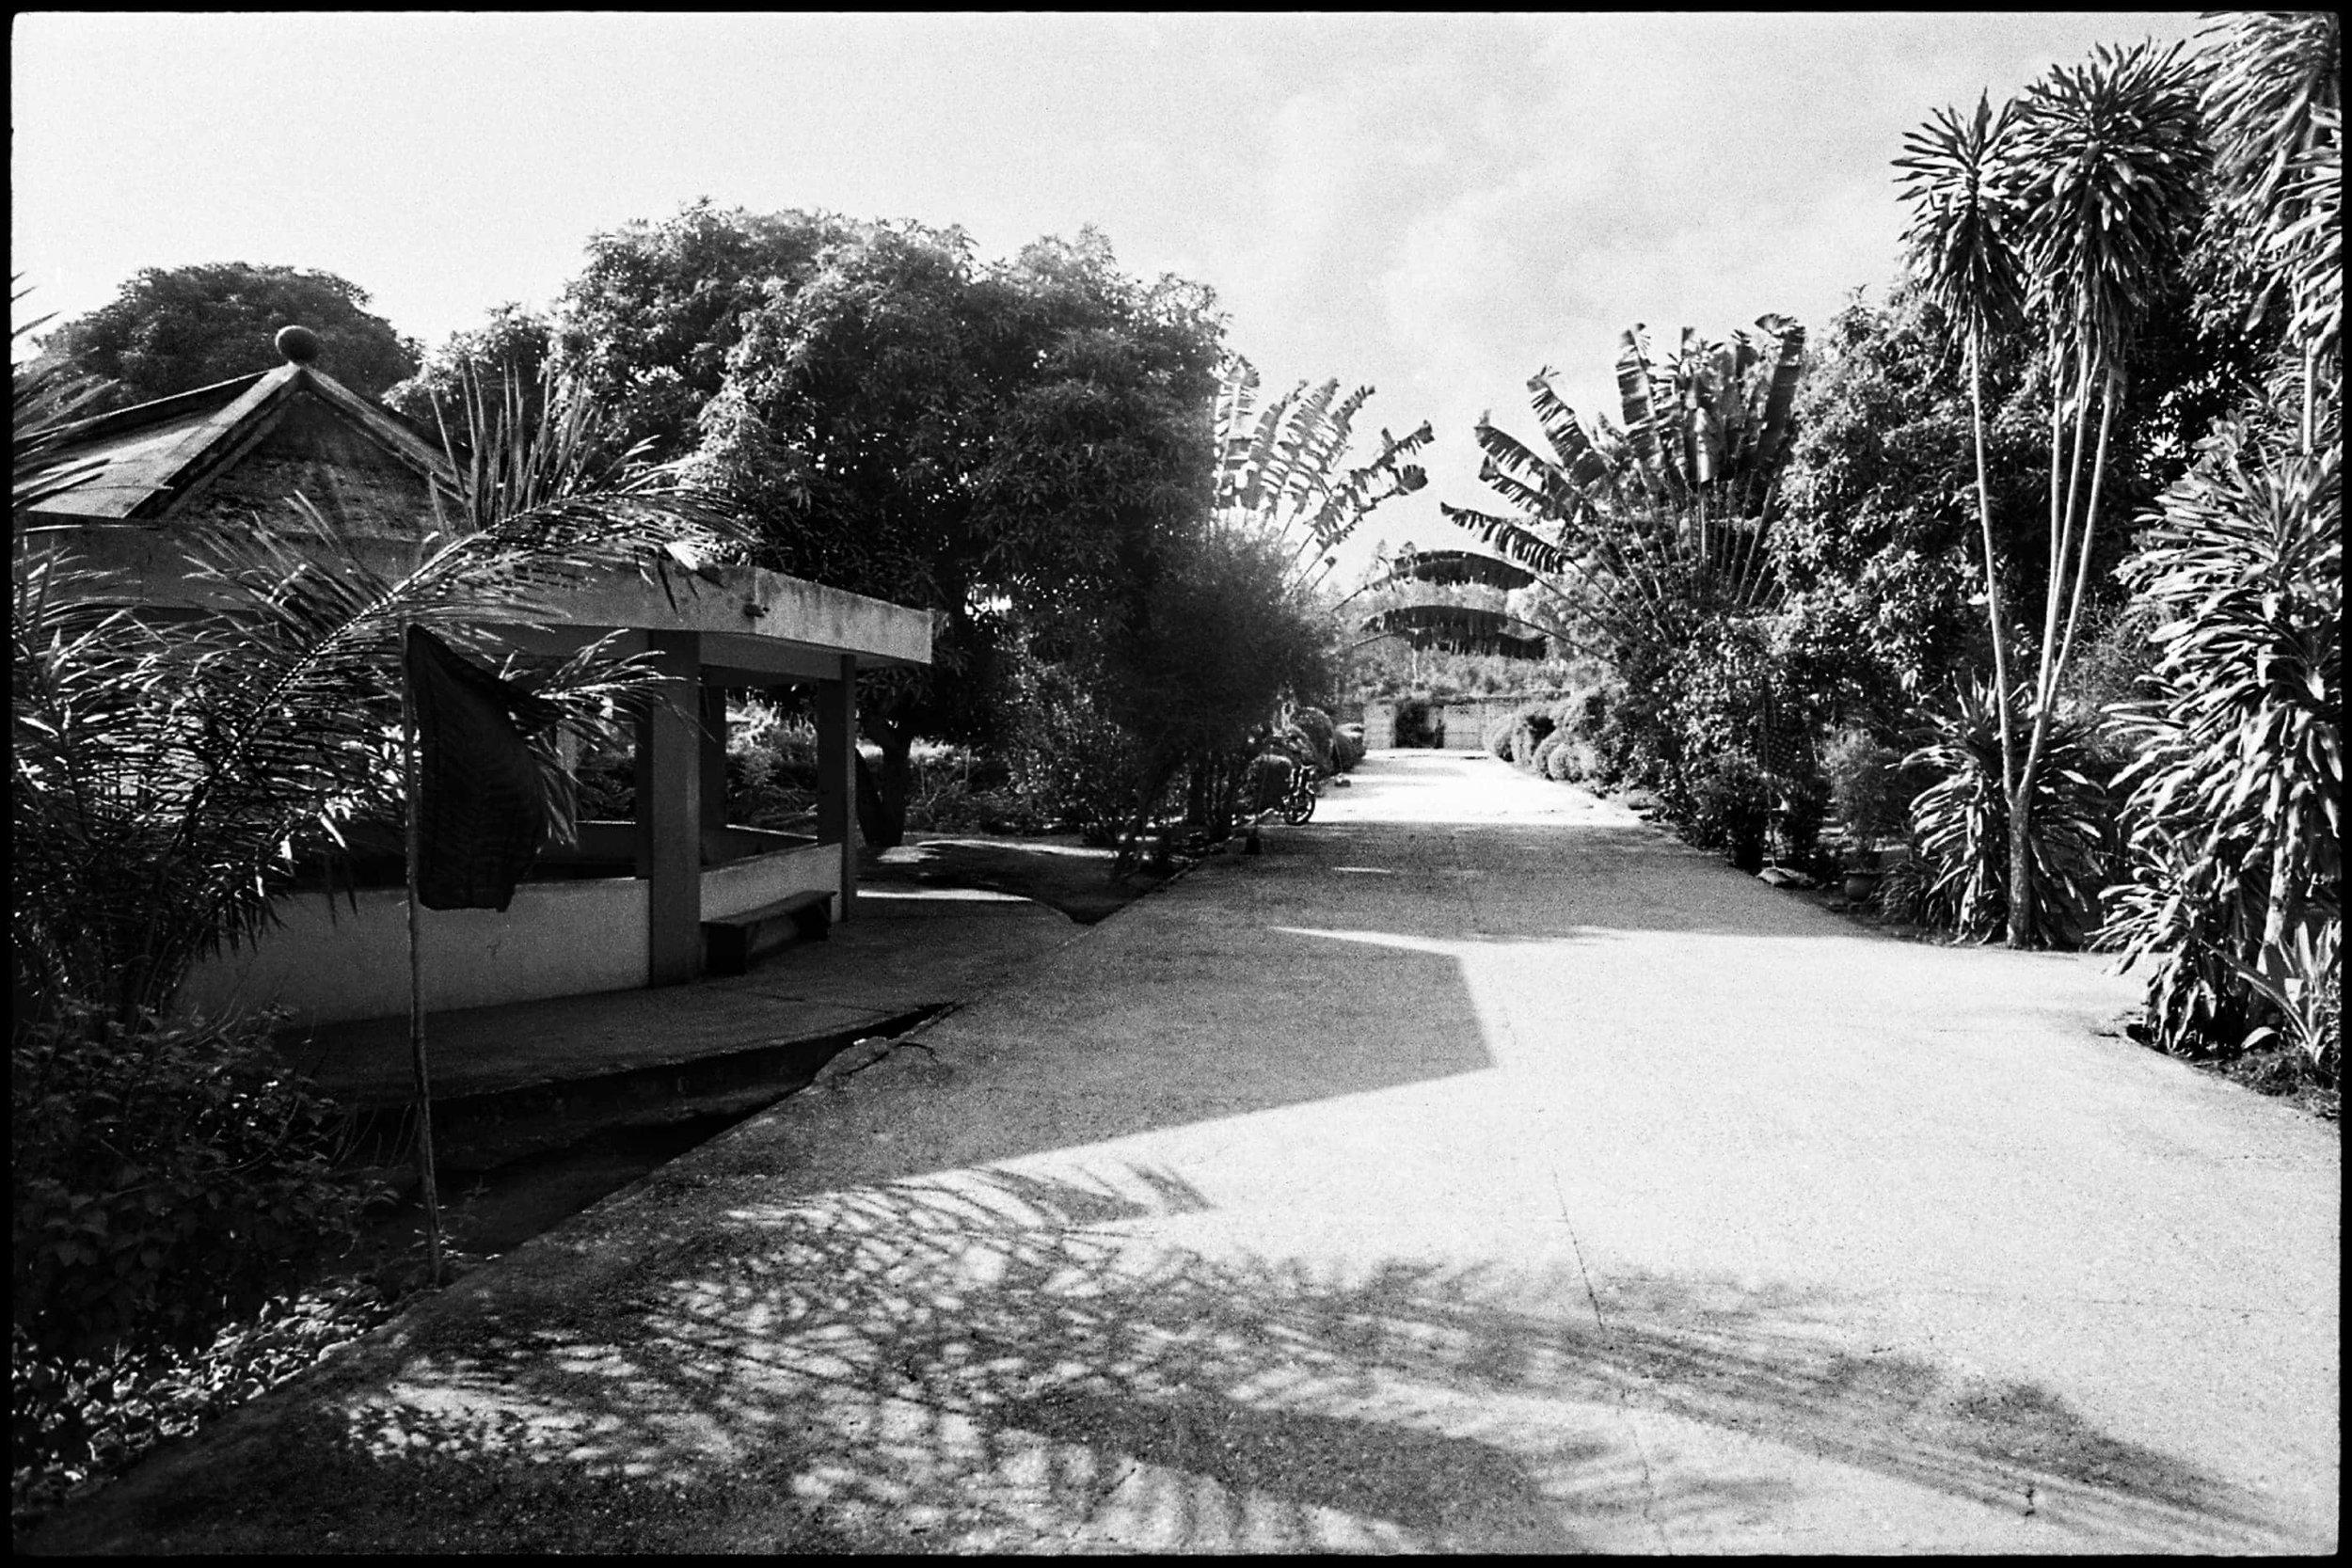 documentary-reportage-centre-les-archanges-fabio-burrelli-4.jpg